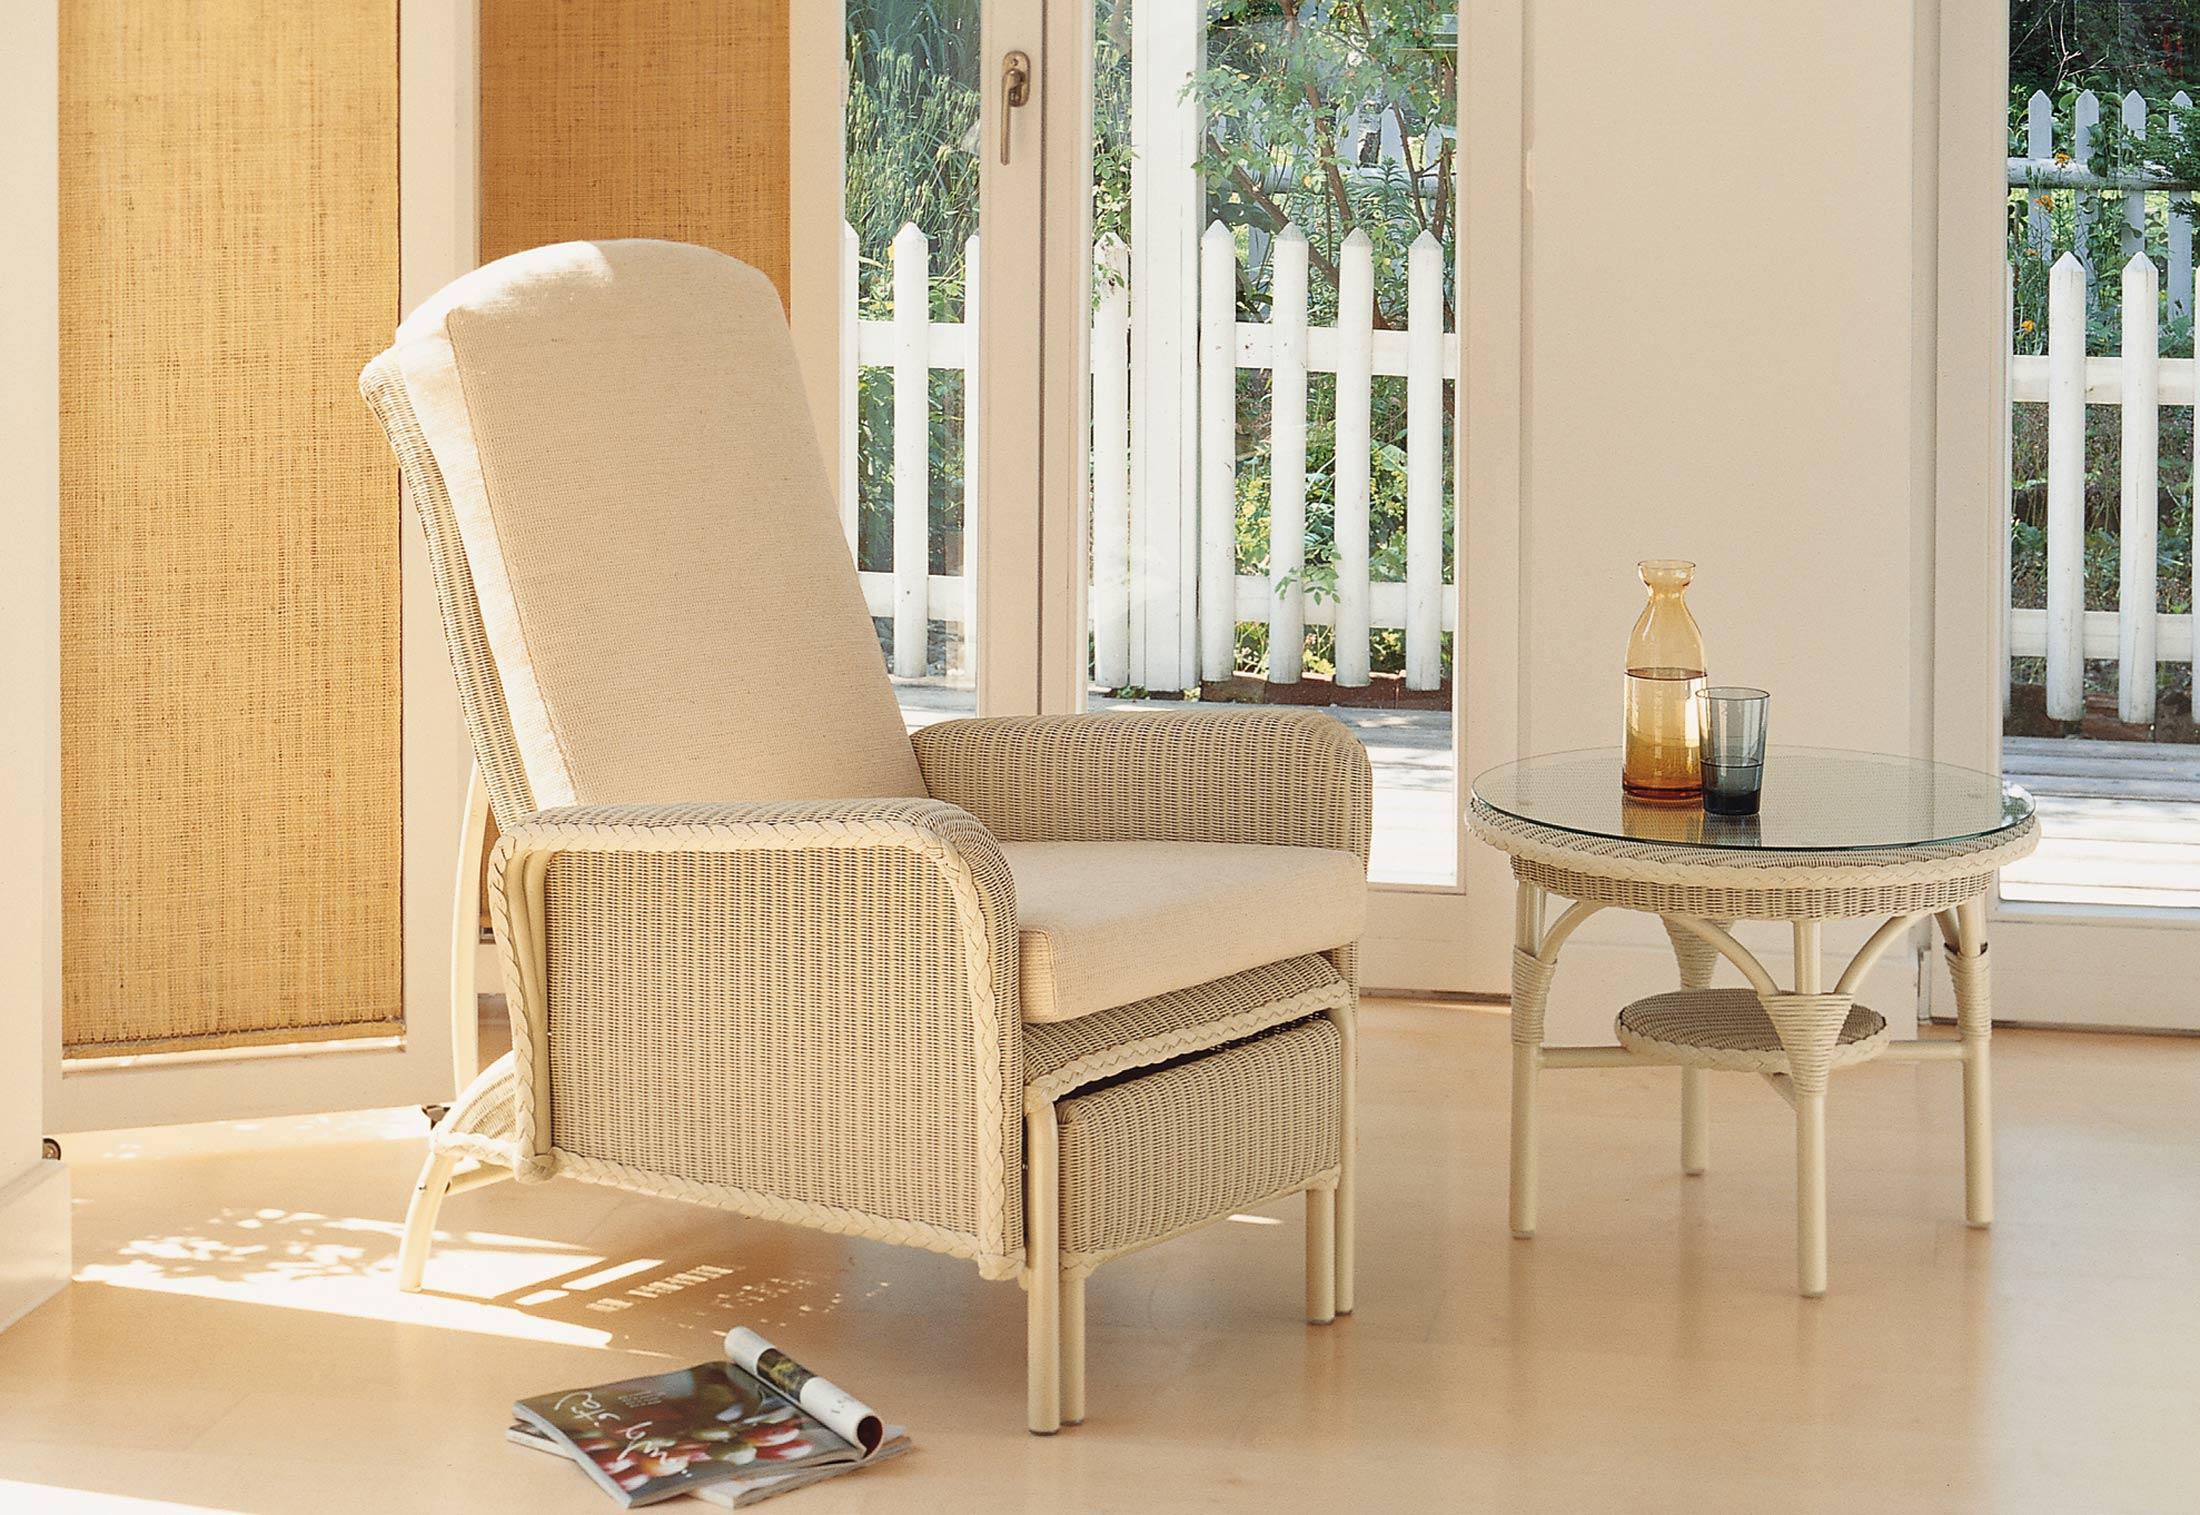 Loom Grand Chair By Garpa Stylepark